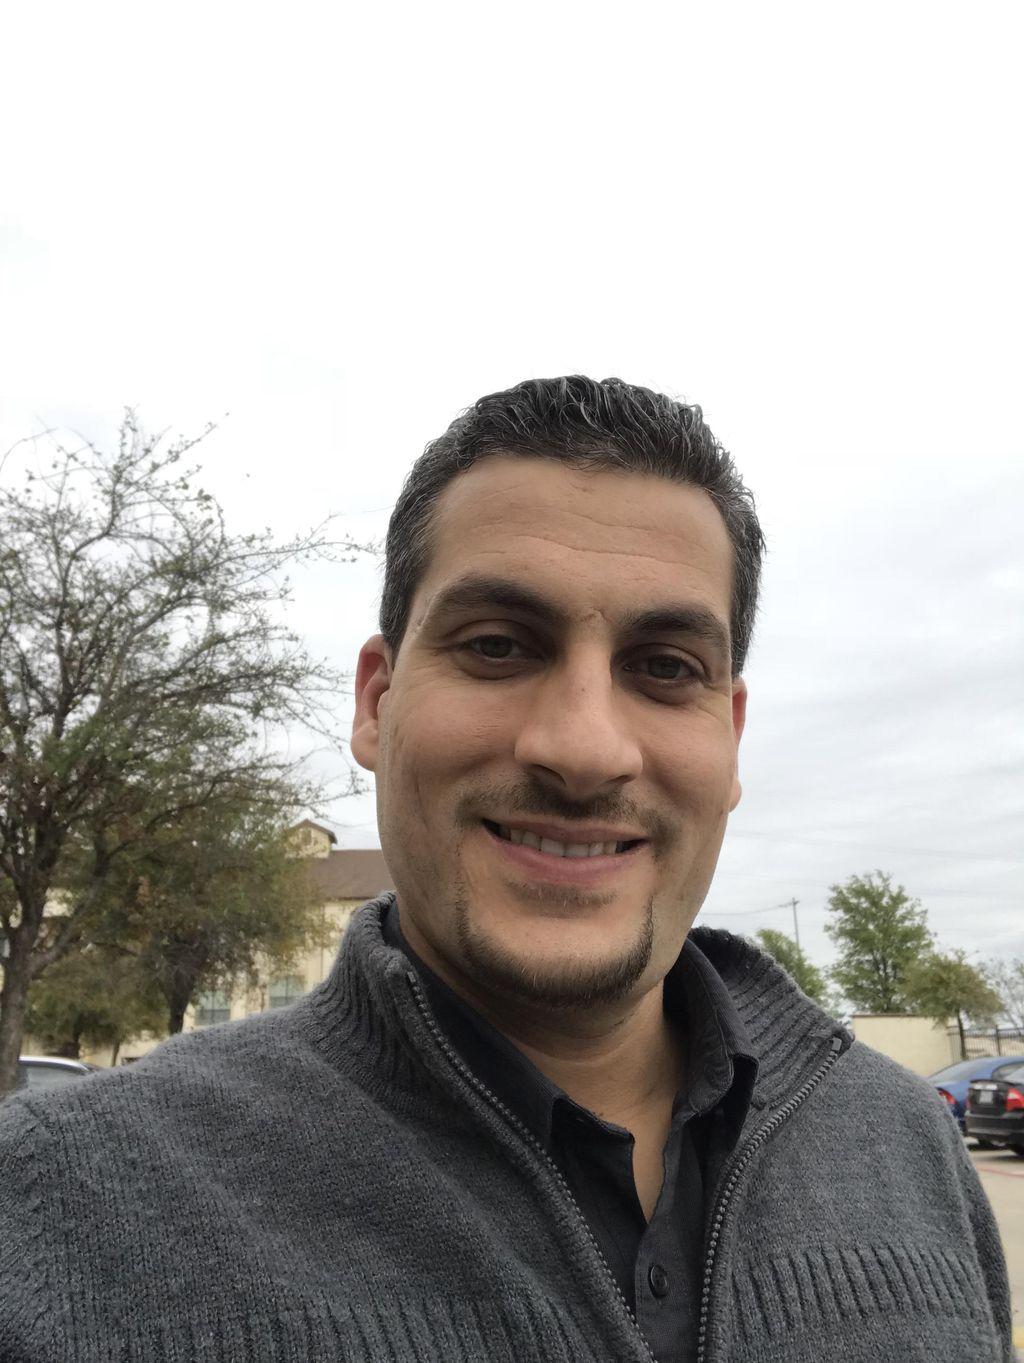 Mustafa Al-Obaidi